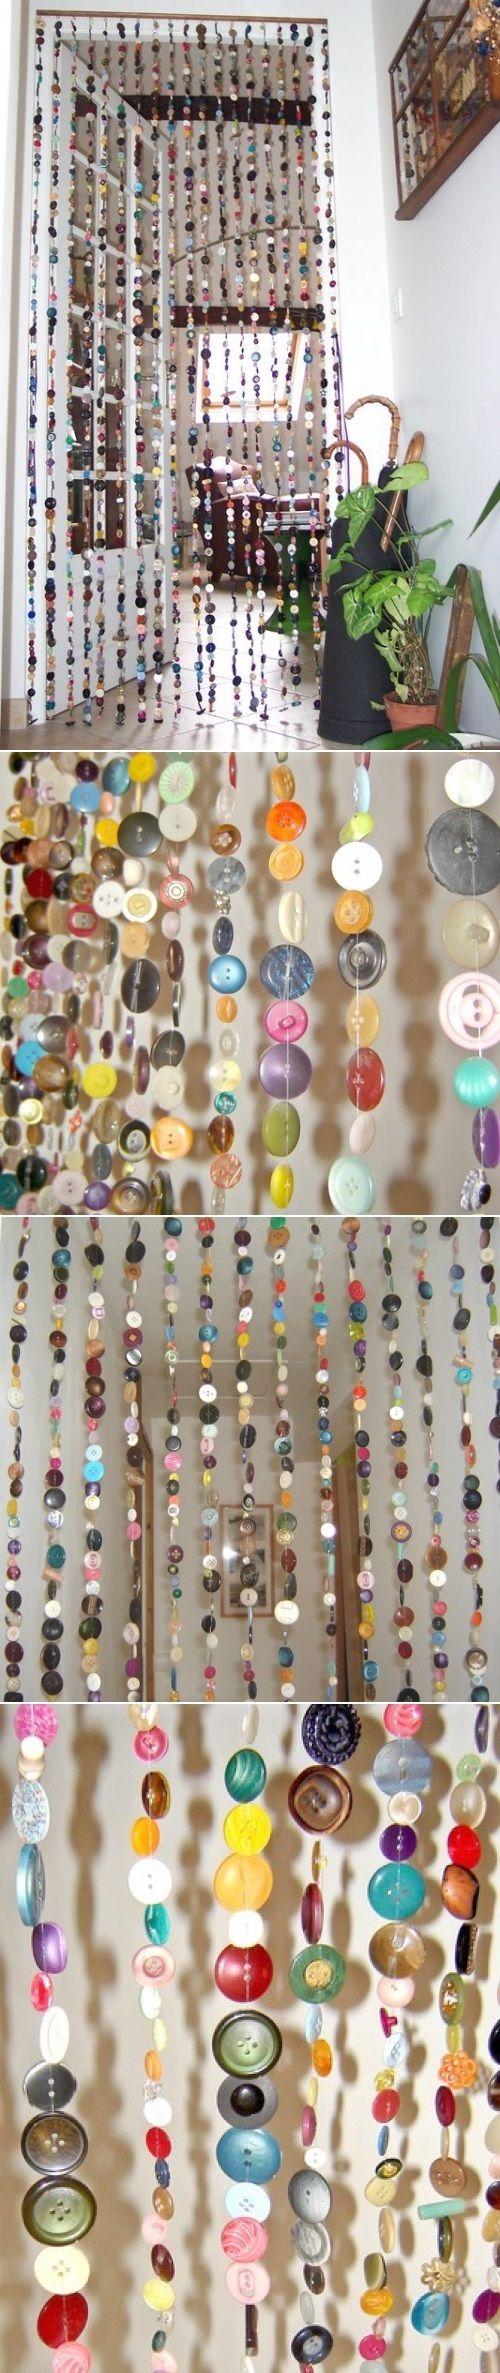 Cortines fetes amb #botons. Una idea genial per aprofitar els botons. Sensacional / Cortinas hechas con #botones. Una idea genail para aprovechar los botones. Sensacional.